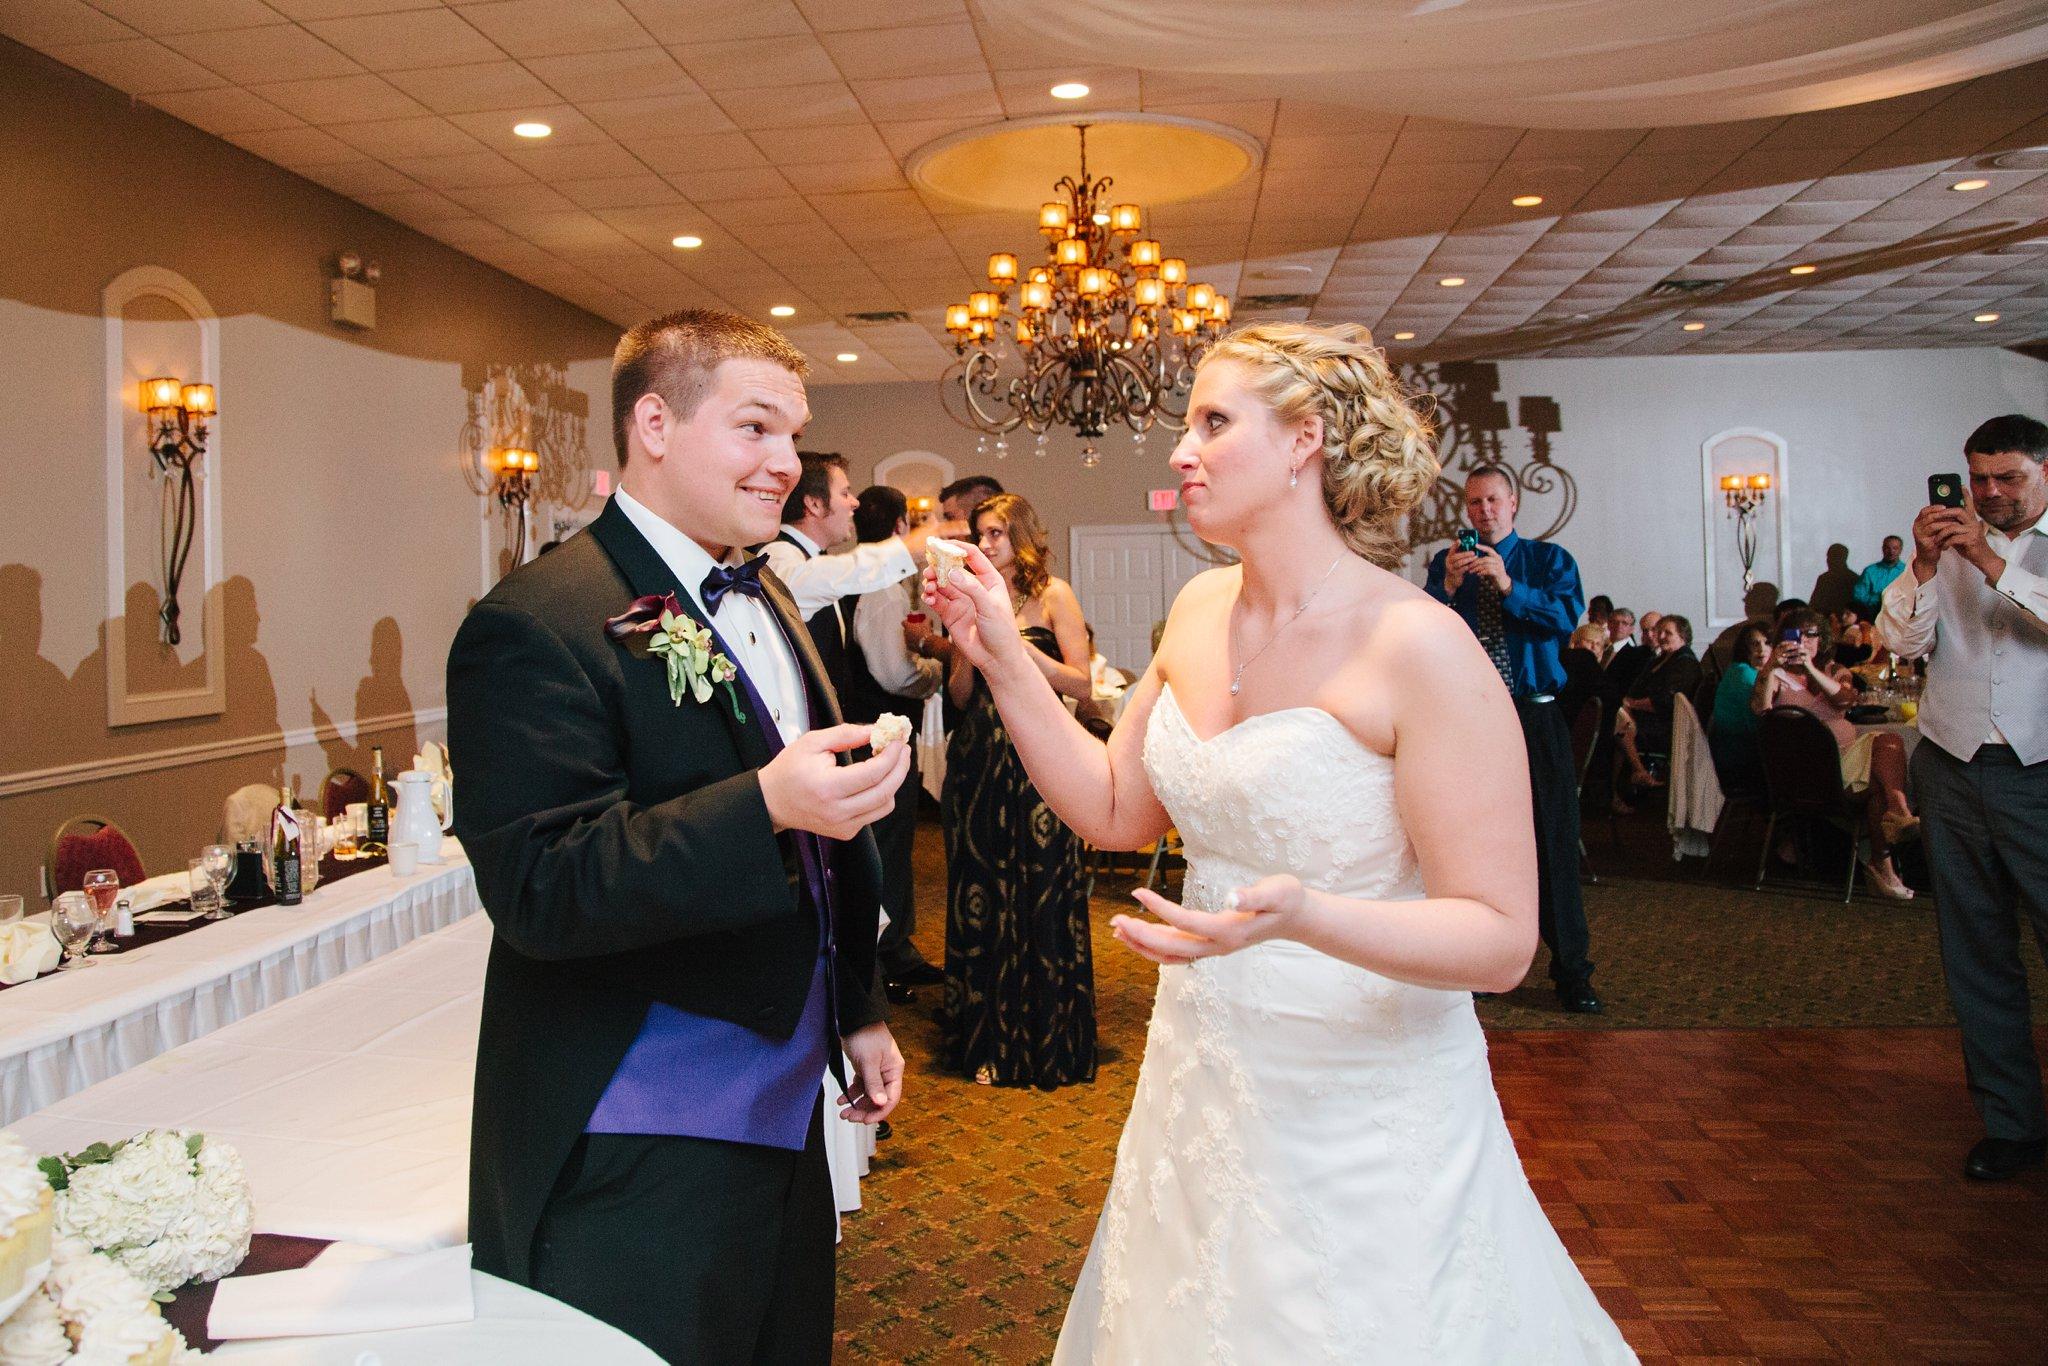 montdale_country_club_wedding_photos_photographer_scranton_pa8098.jpg